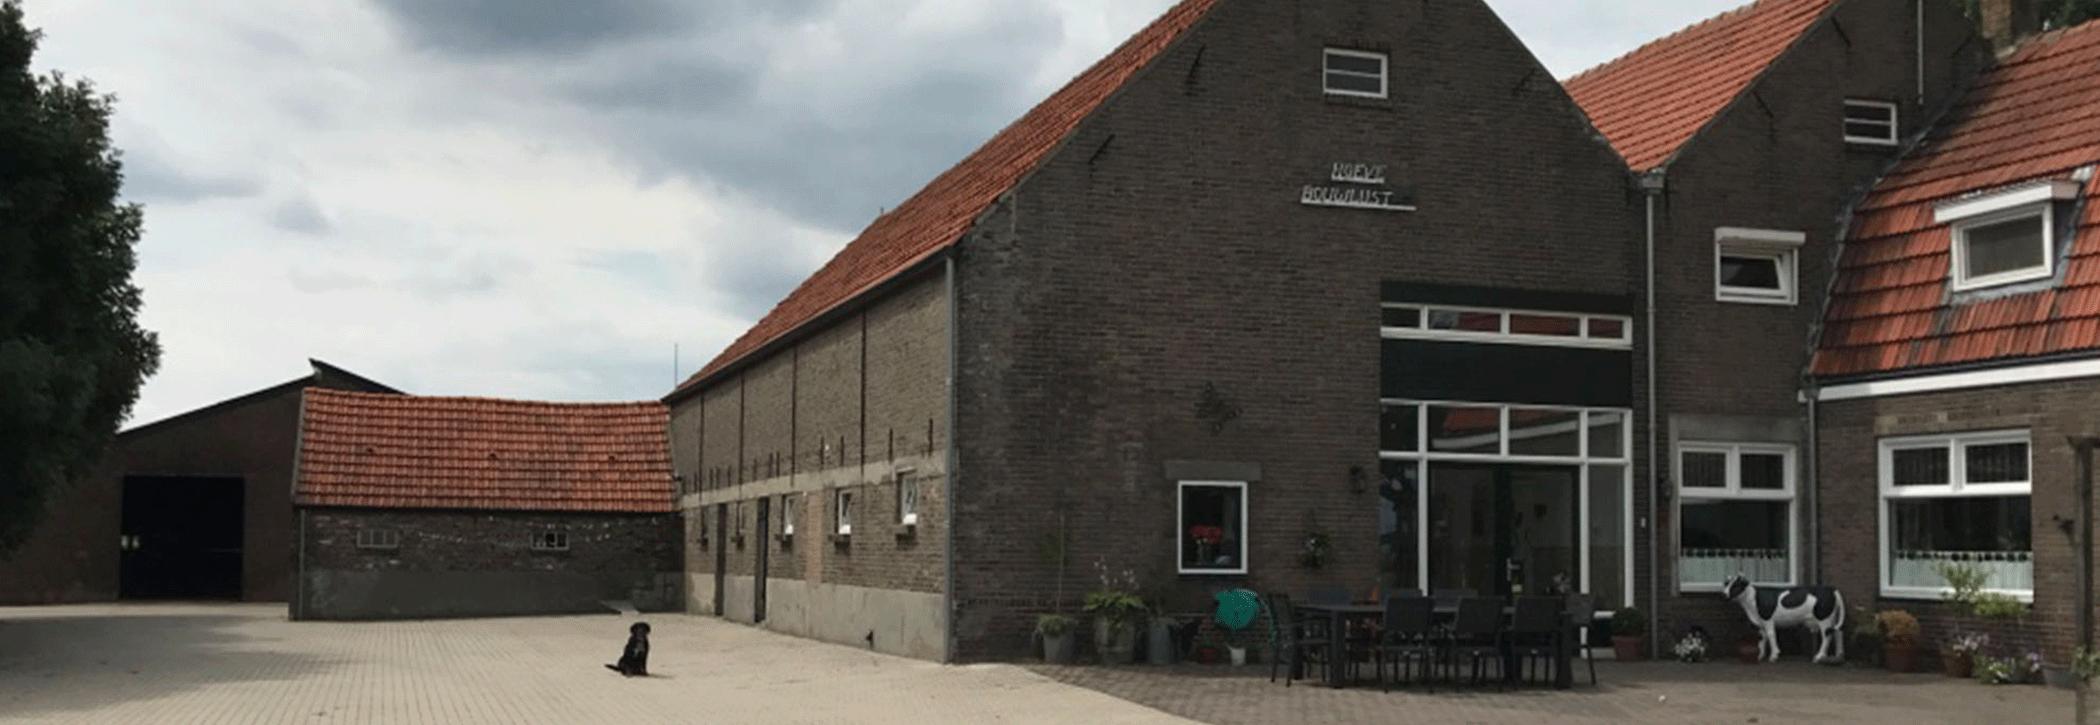 Boerderijcamping hoeve bouwlust